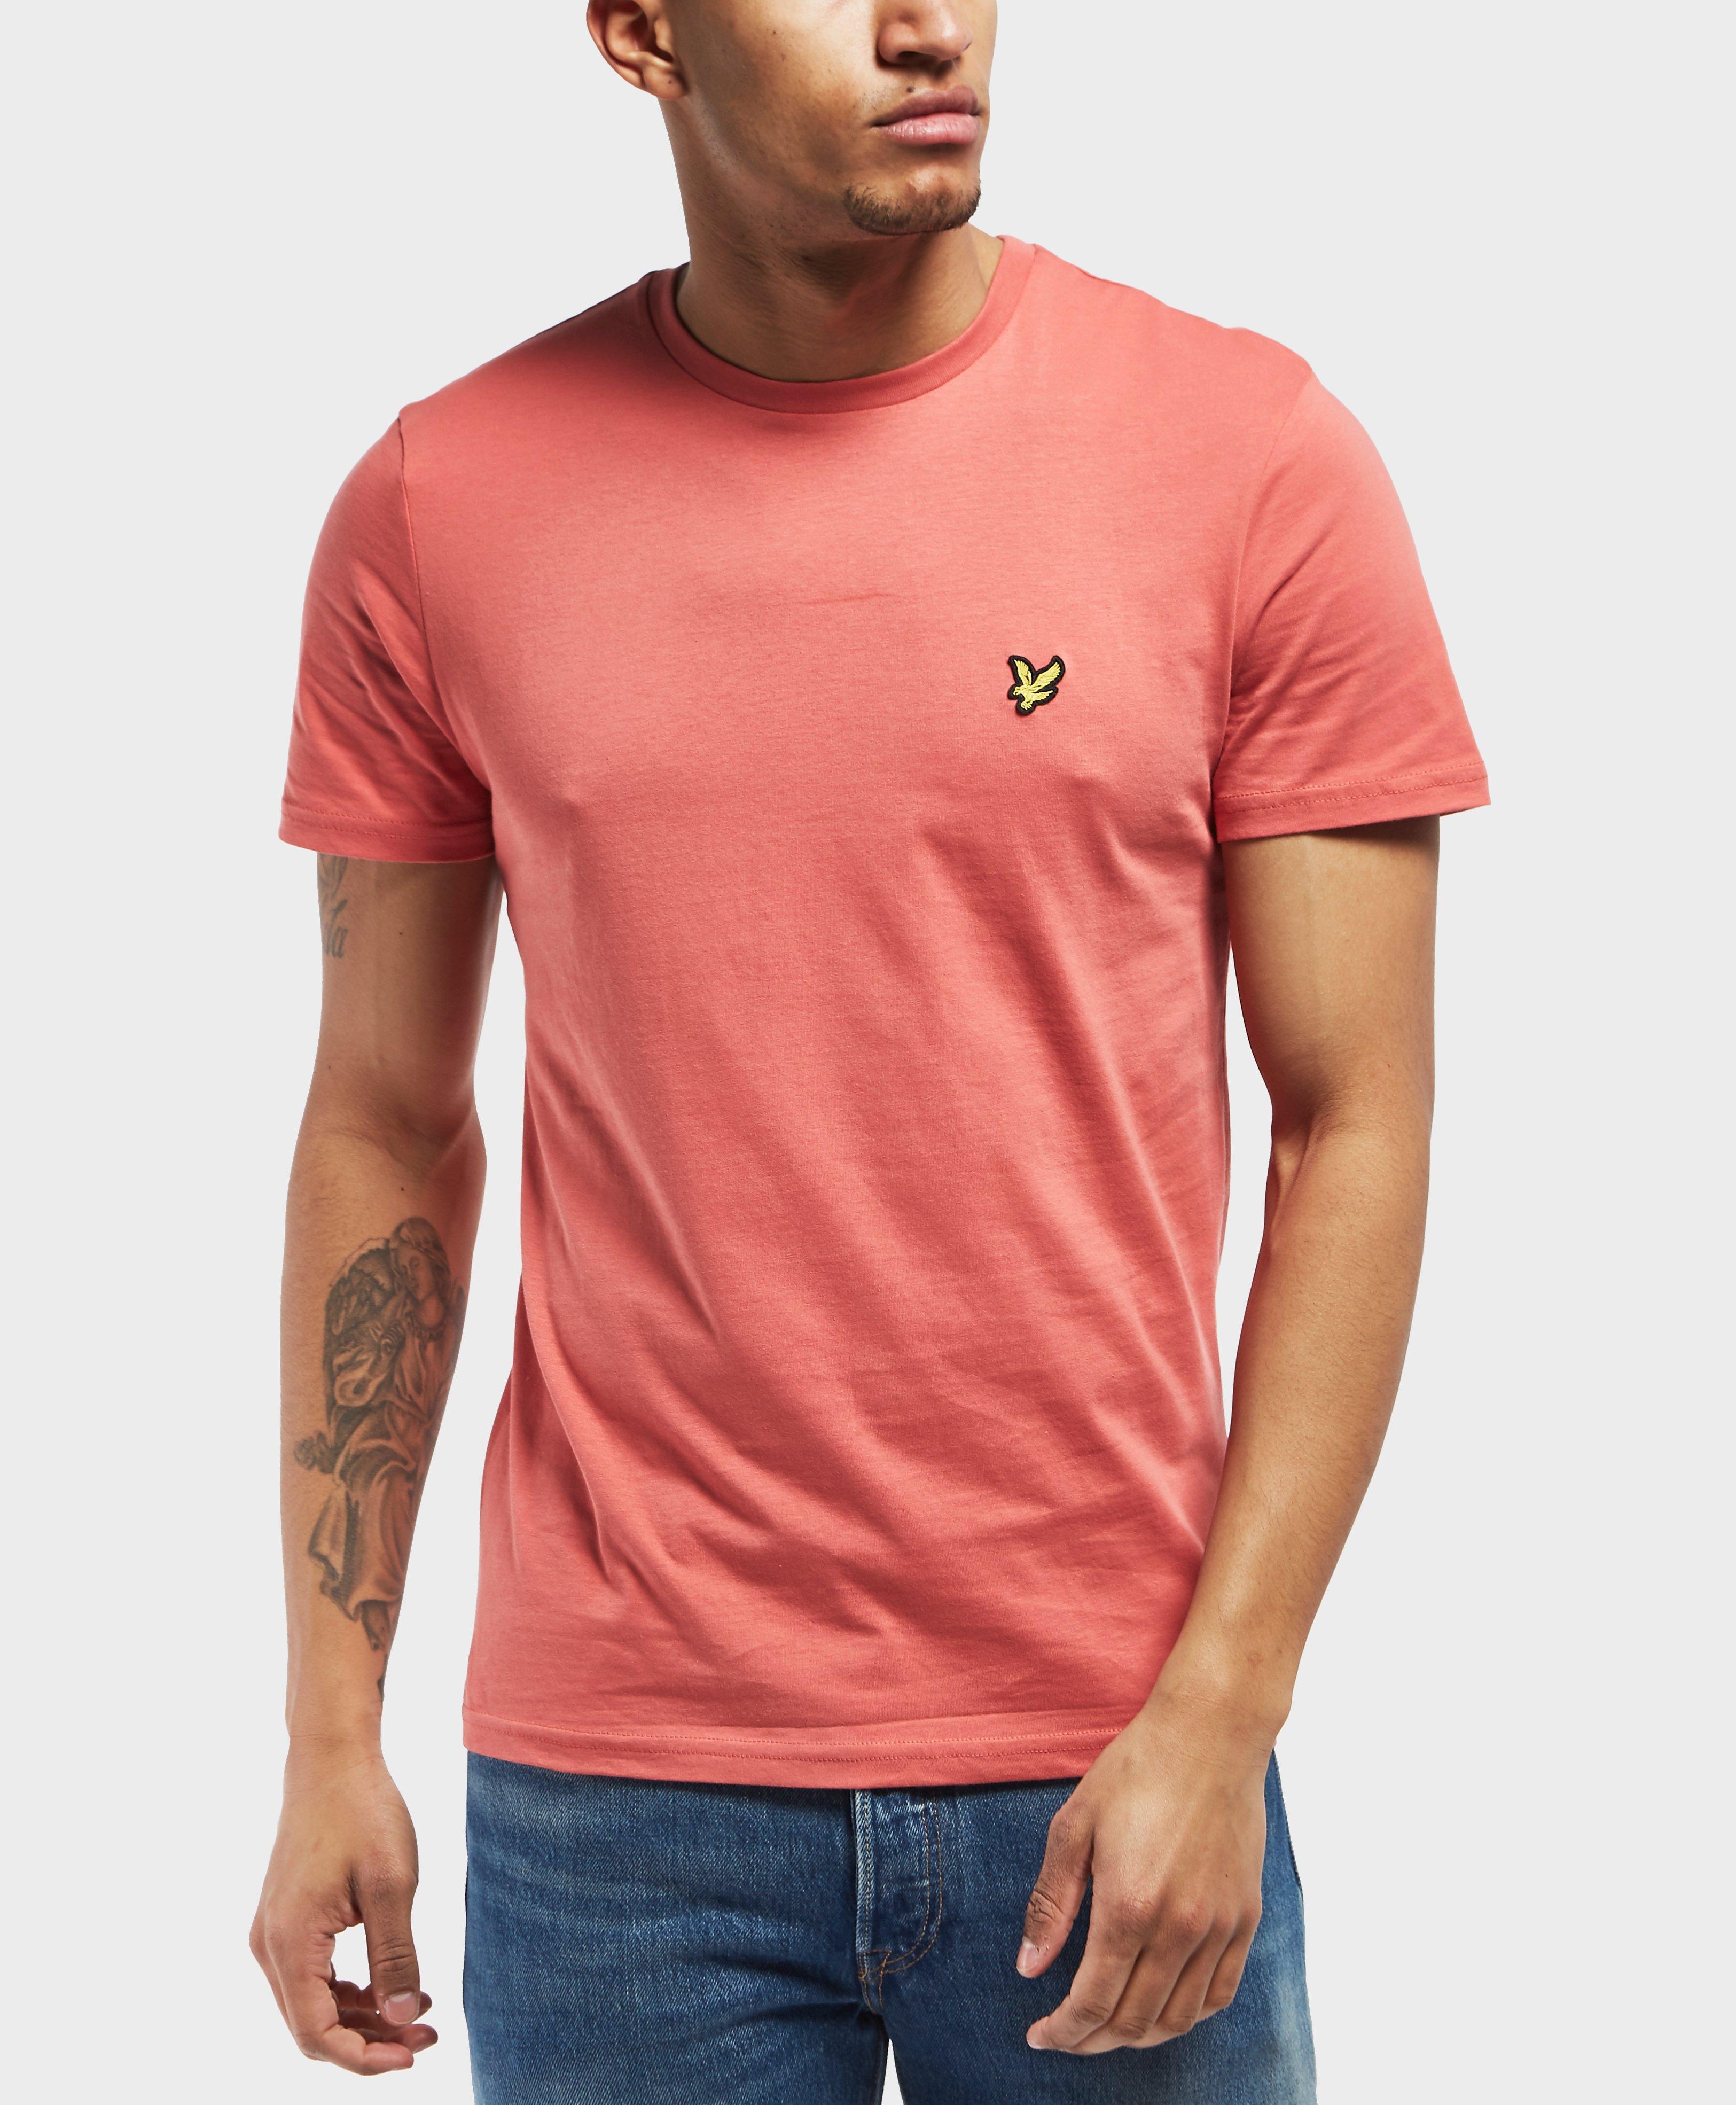 8bed0c7e8 Lyle & Scott Crew Neck Short Sleeve T-shirt for Men - Lyst